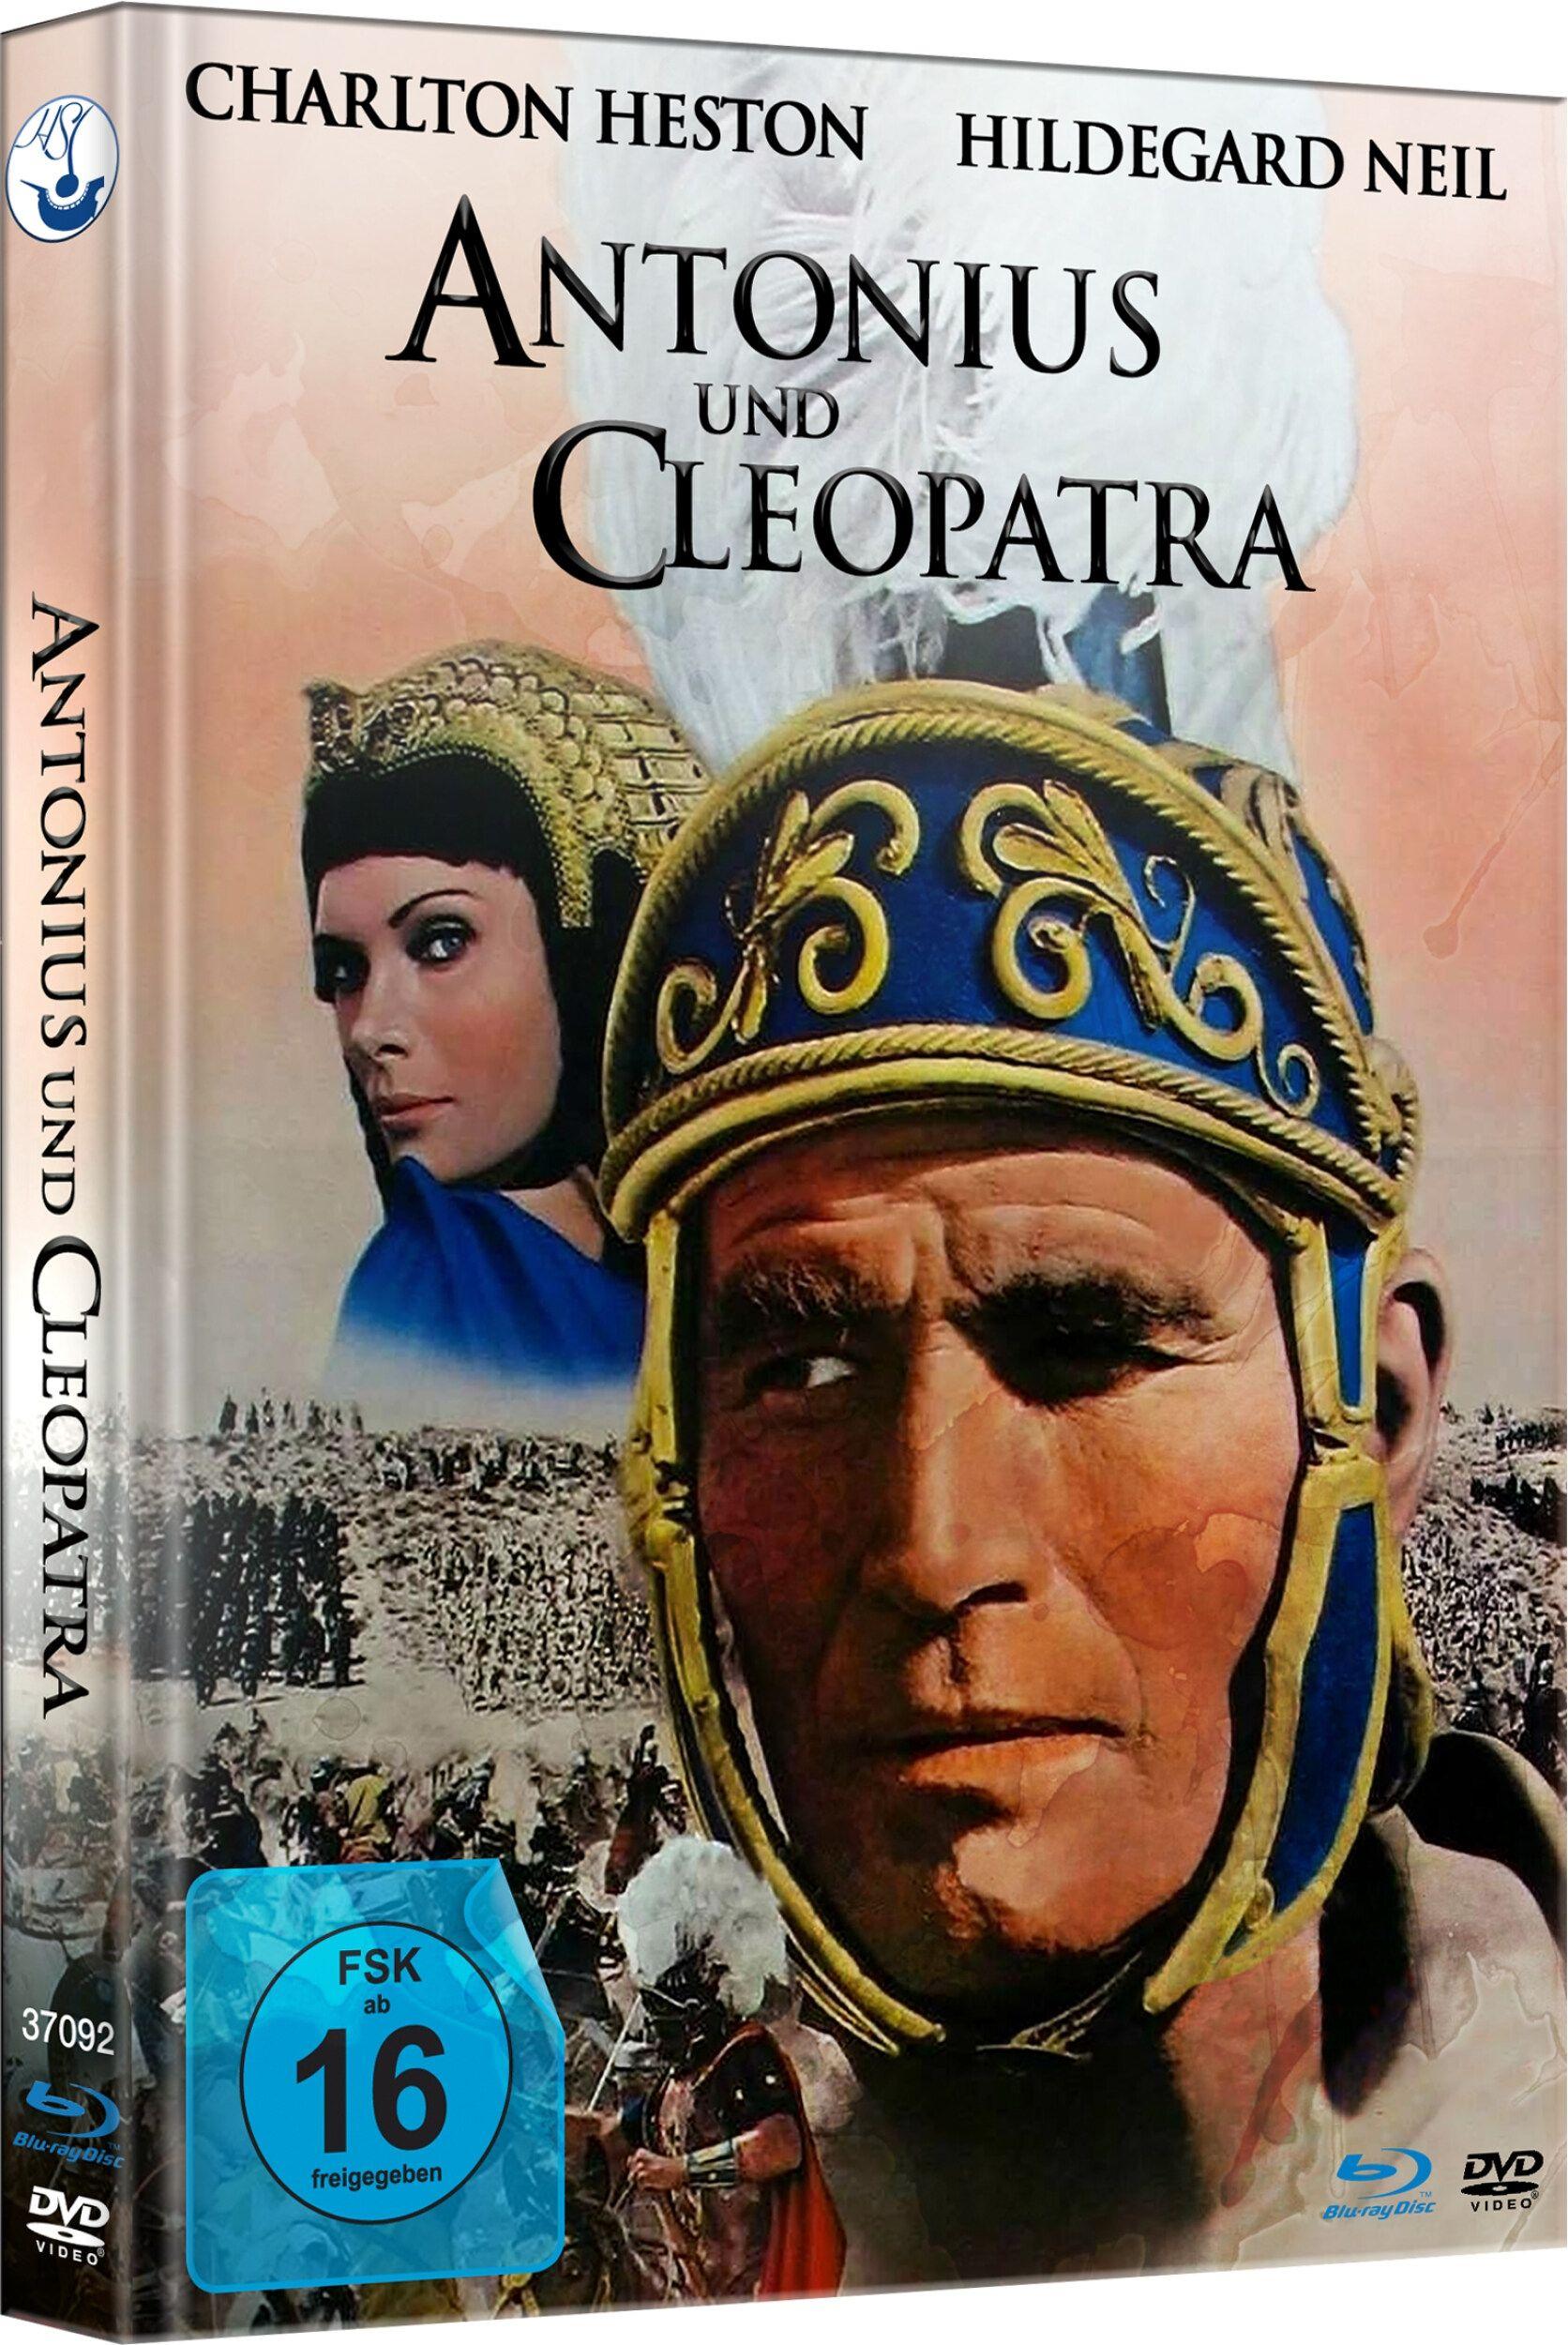 Antonius und Cleopatra (Lim. Uncut Mediabook) (DVD + BLURAY)